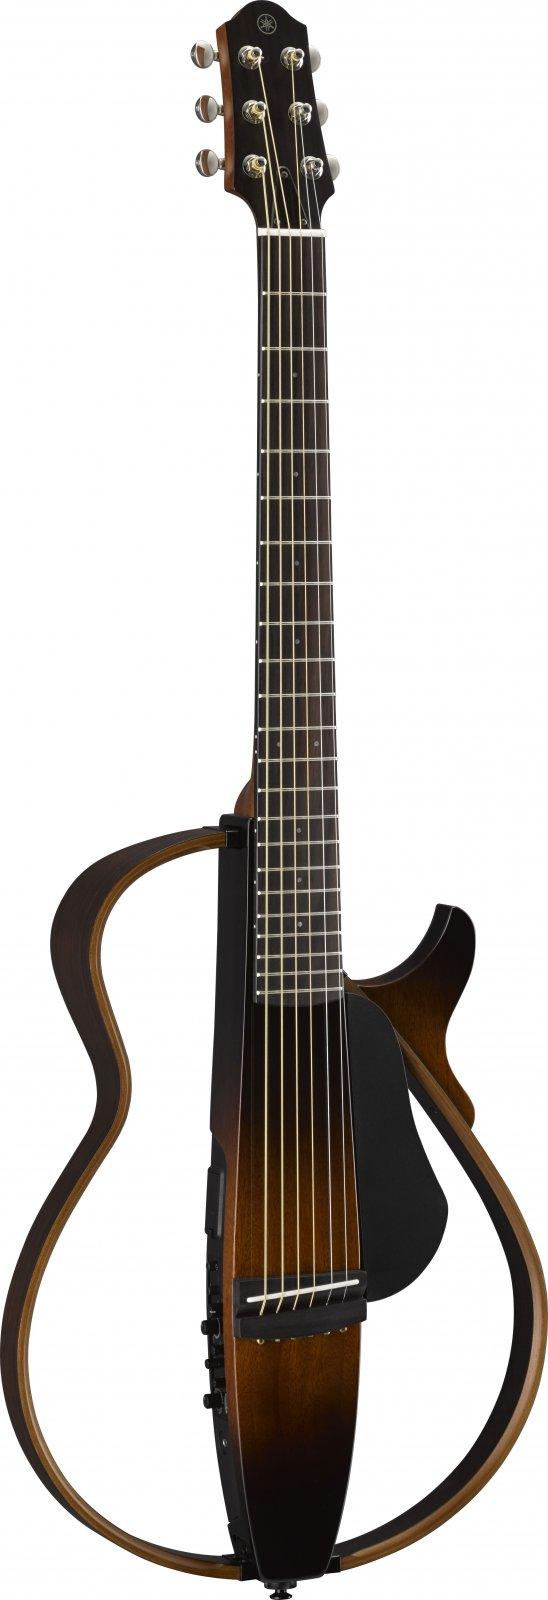 Yamaha SLG200S Silent Guitar - Tobacco Sunburst